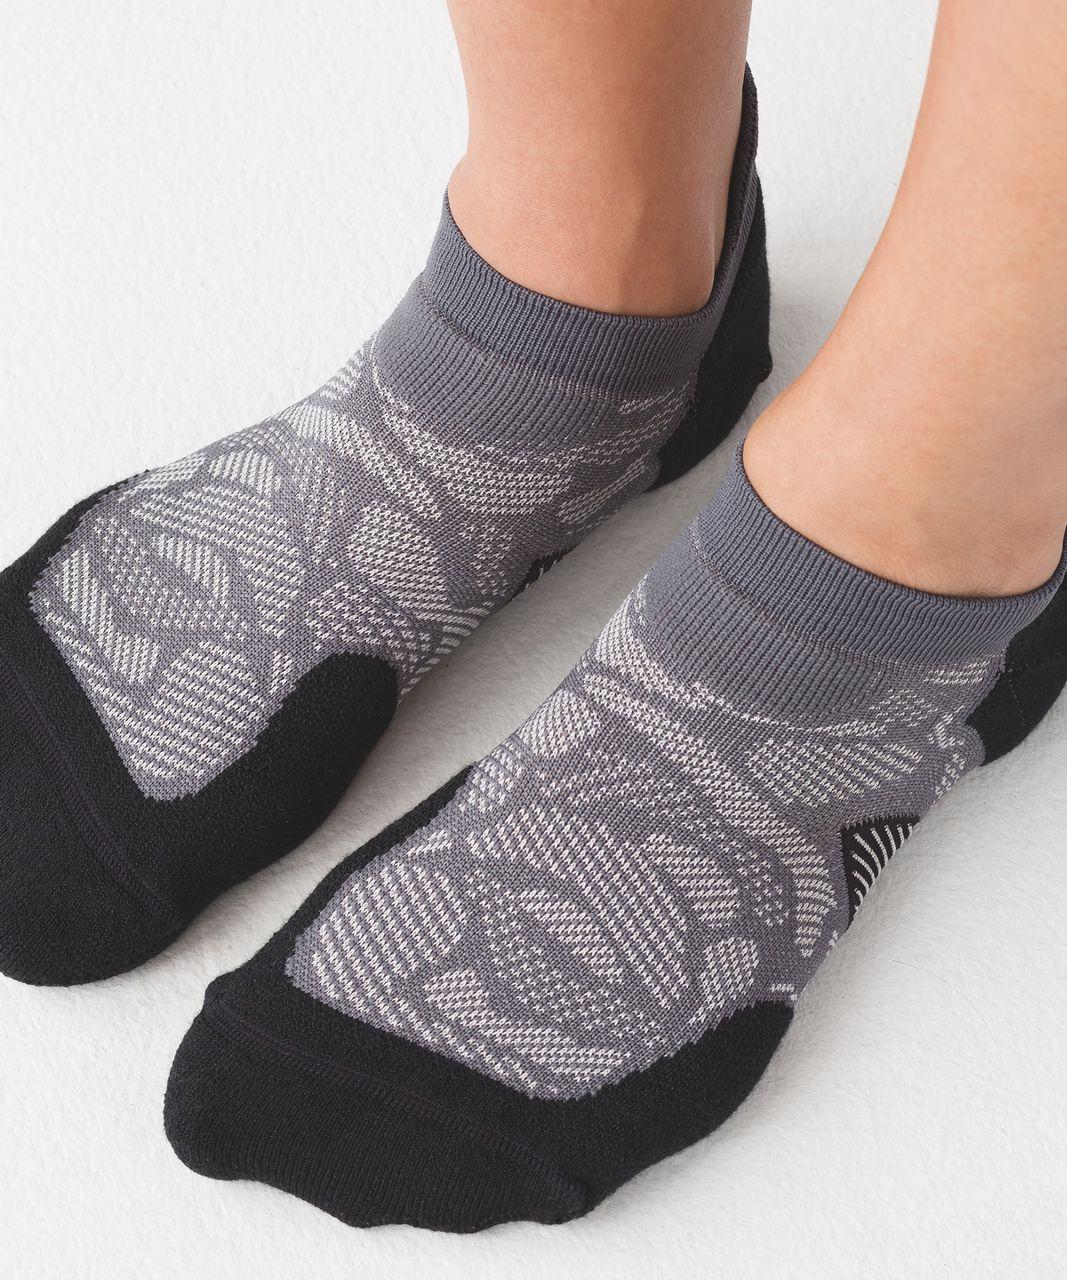 Lululemon High Speed Sock (Silver) - Dark Carbon / Black / Moonlit Magenta